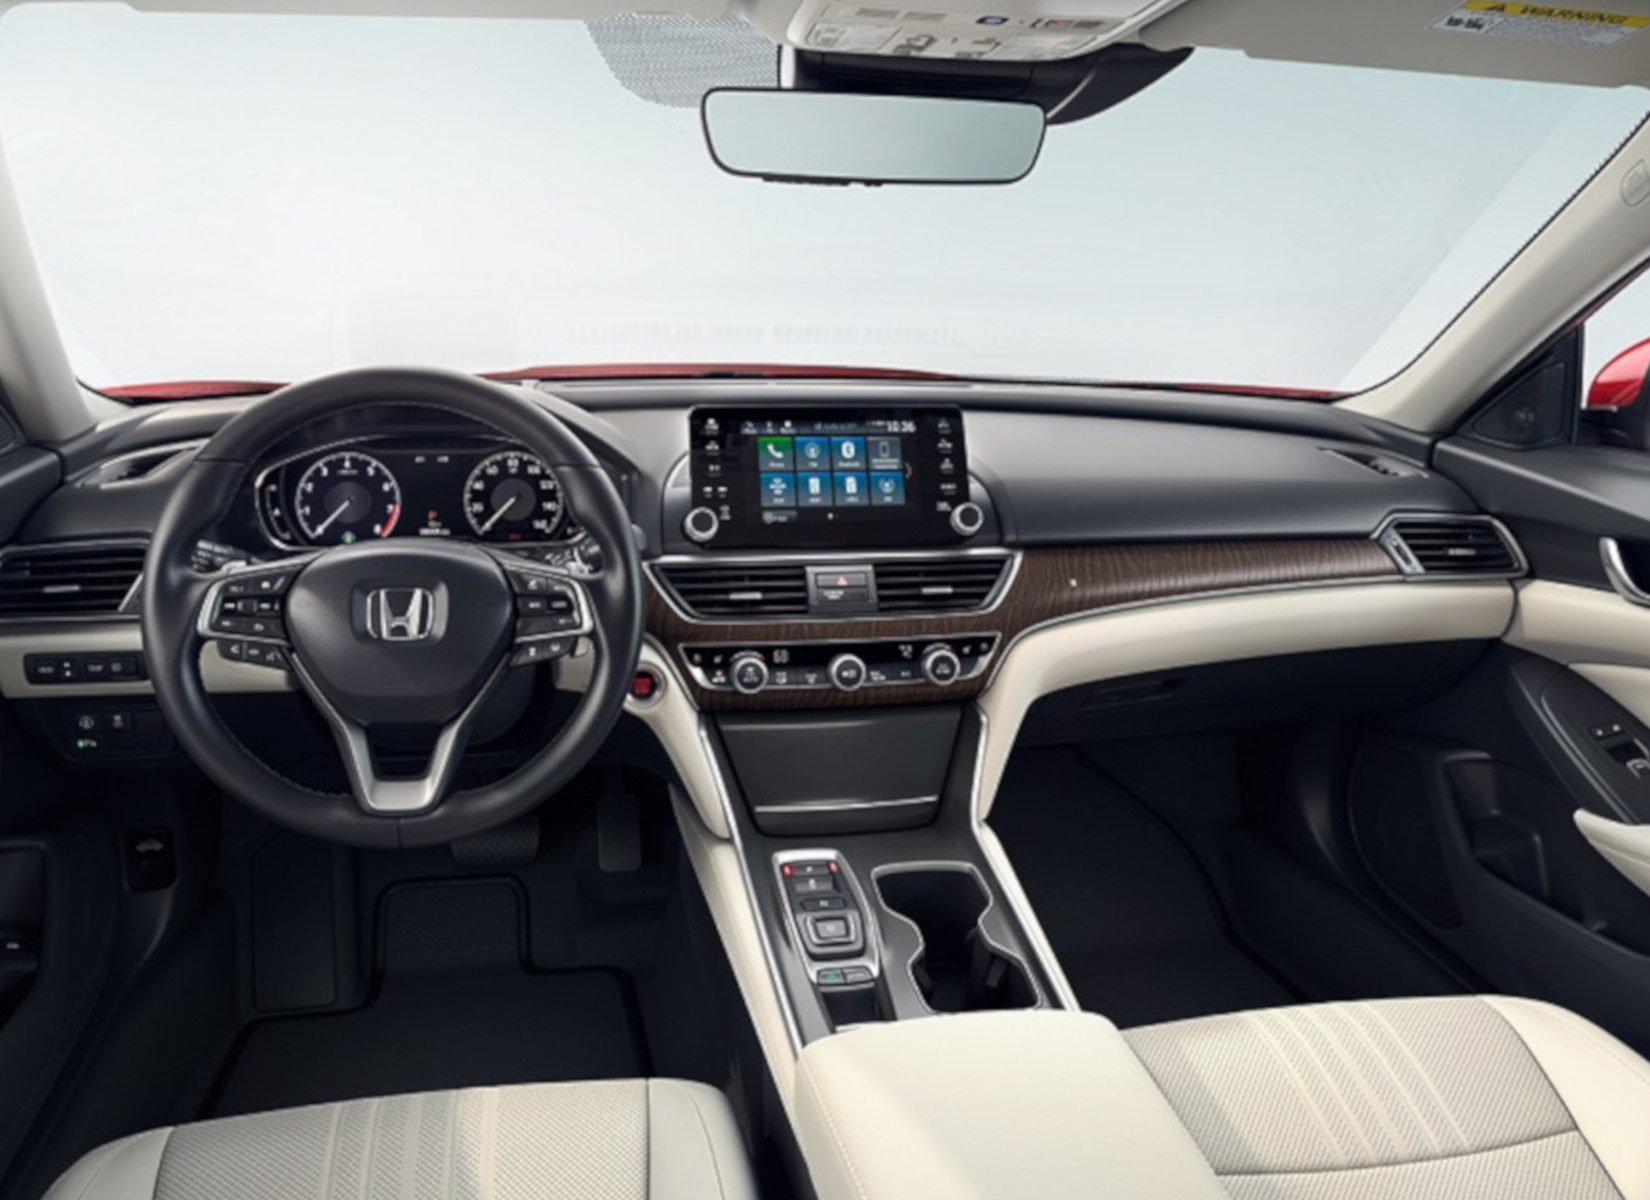 Touchscreen display inside the 2019 Honda Accord